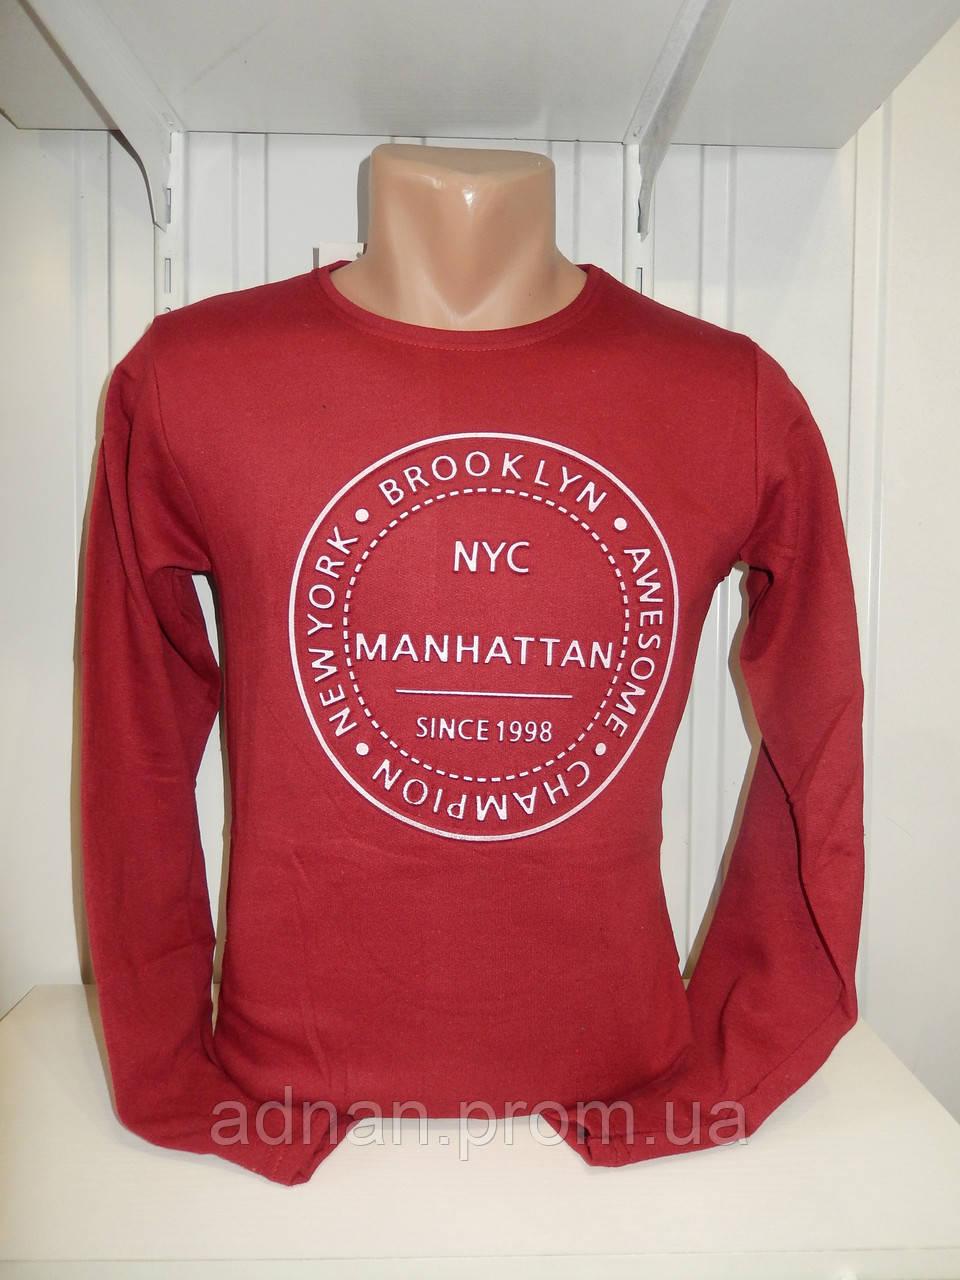 Батник мужской RBS, 3D MANHATTAN, на байке 001/ купить батник, оптом